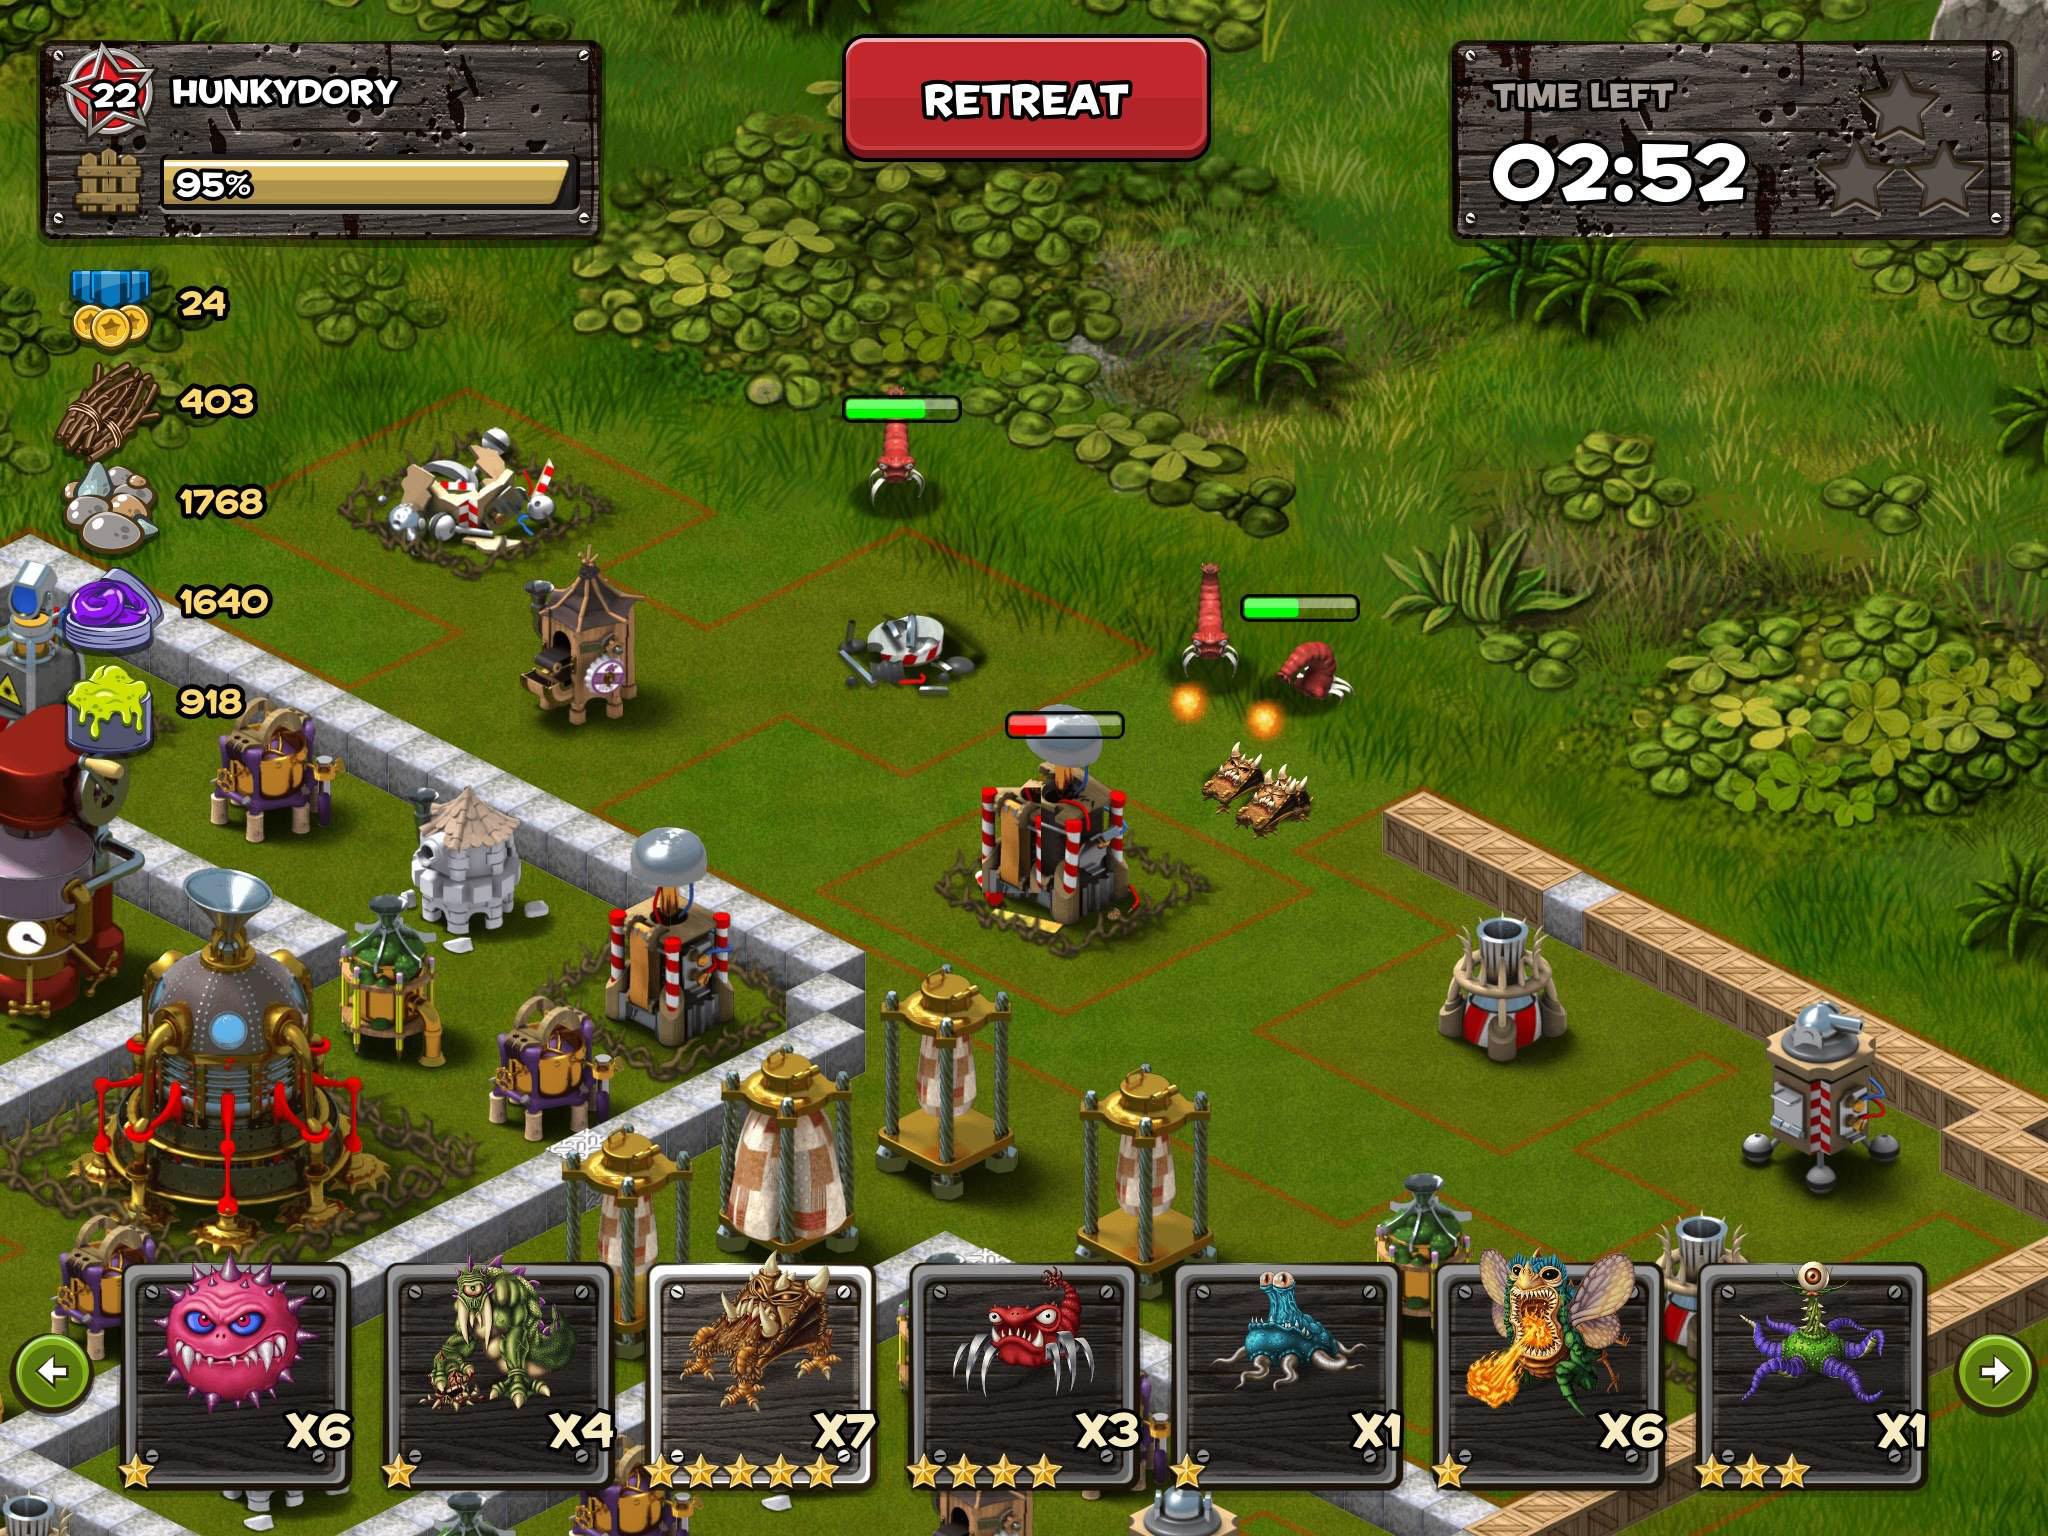 Backyard Monsters: Unleashed IPhone,iPad, Screenshot 4